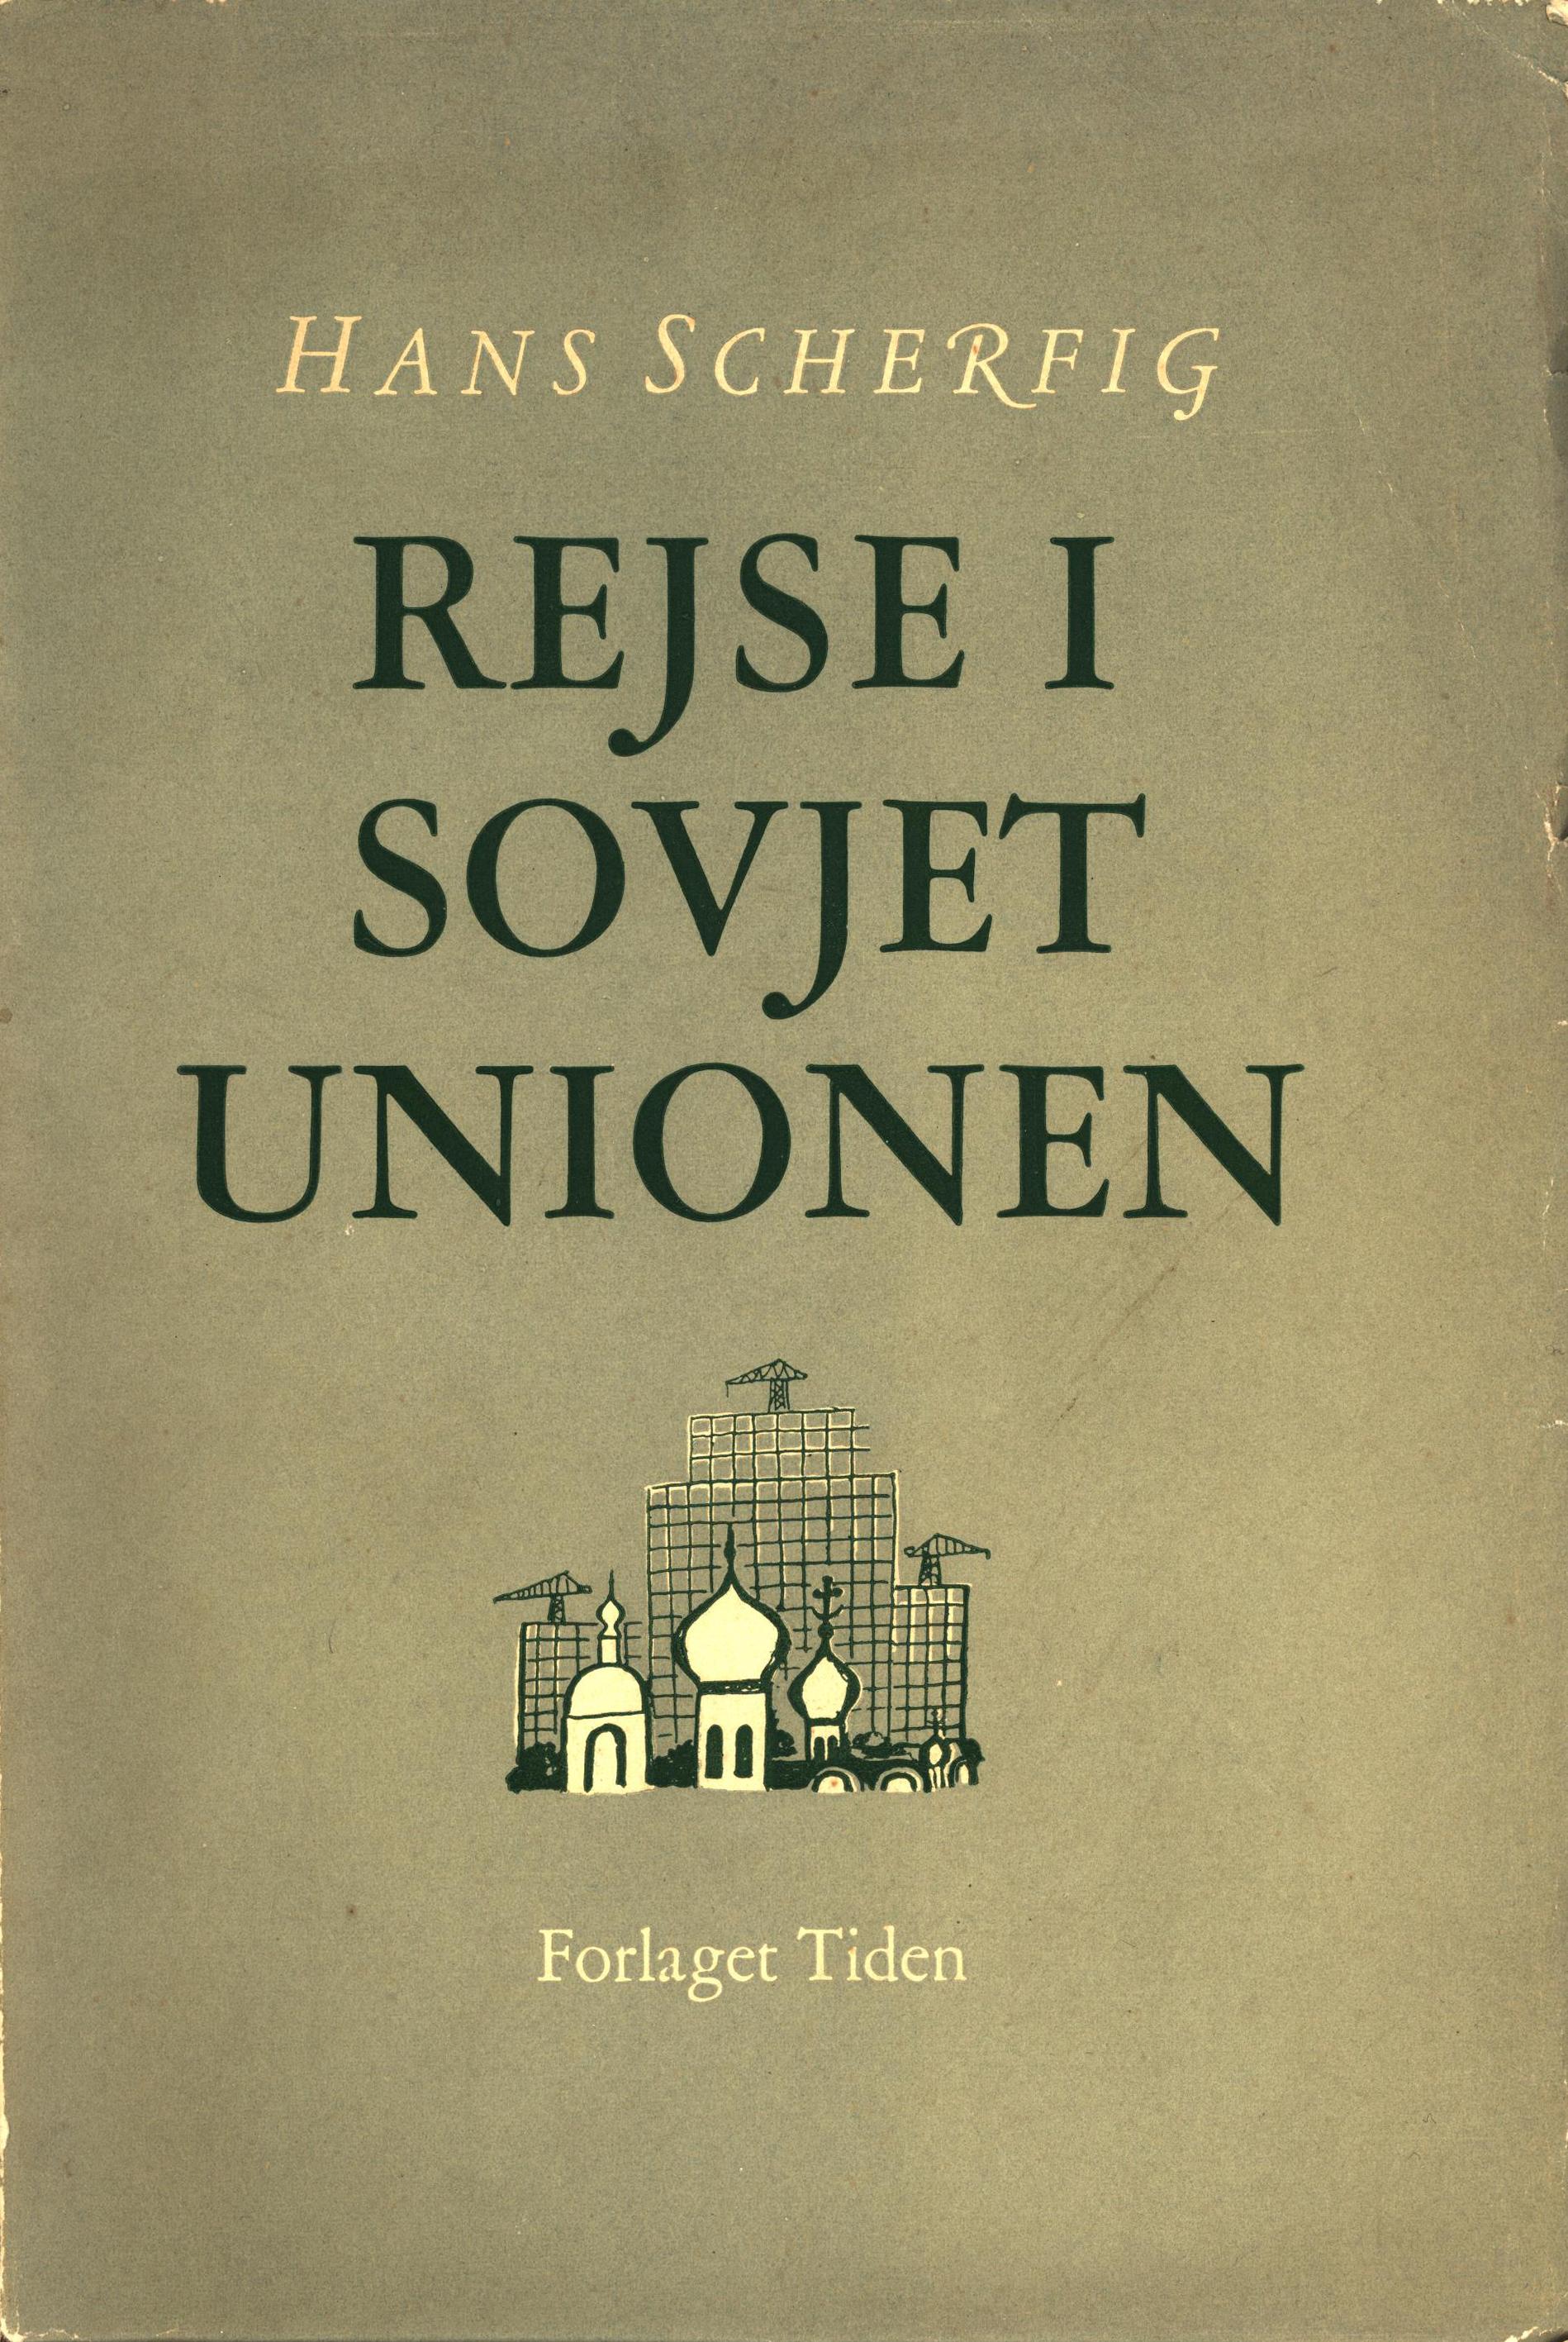 Hans Scherfig: Rejse i Sovjetunionen